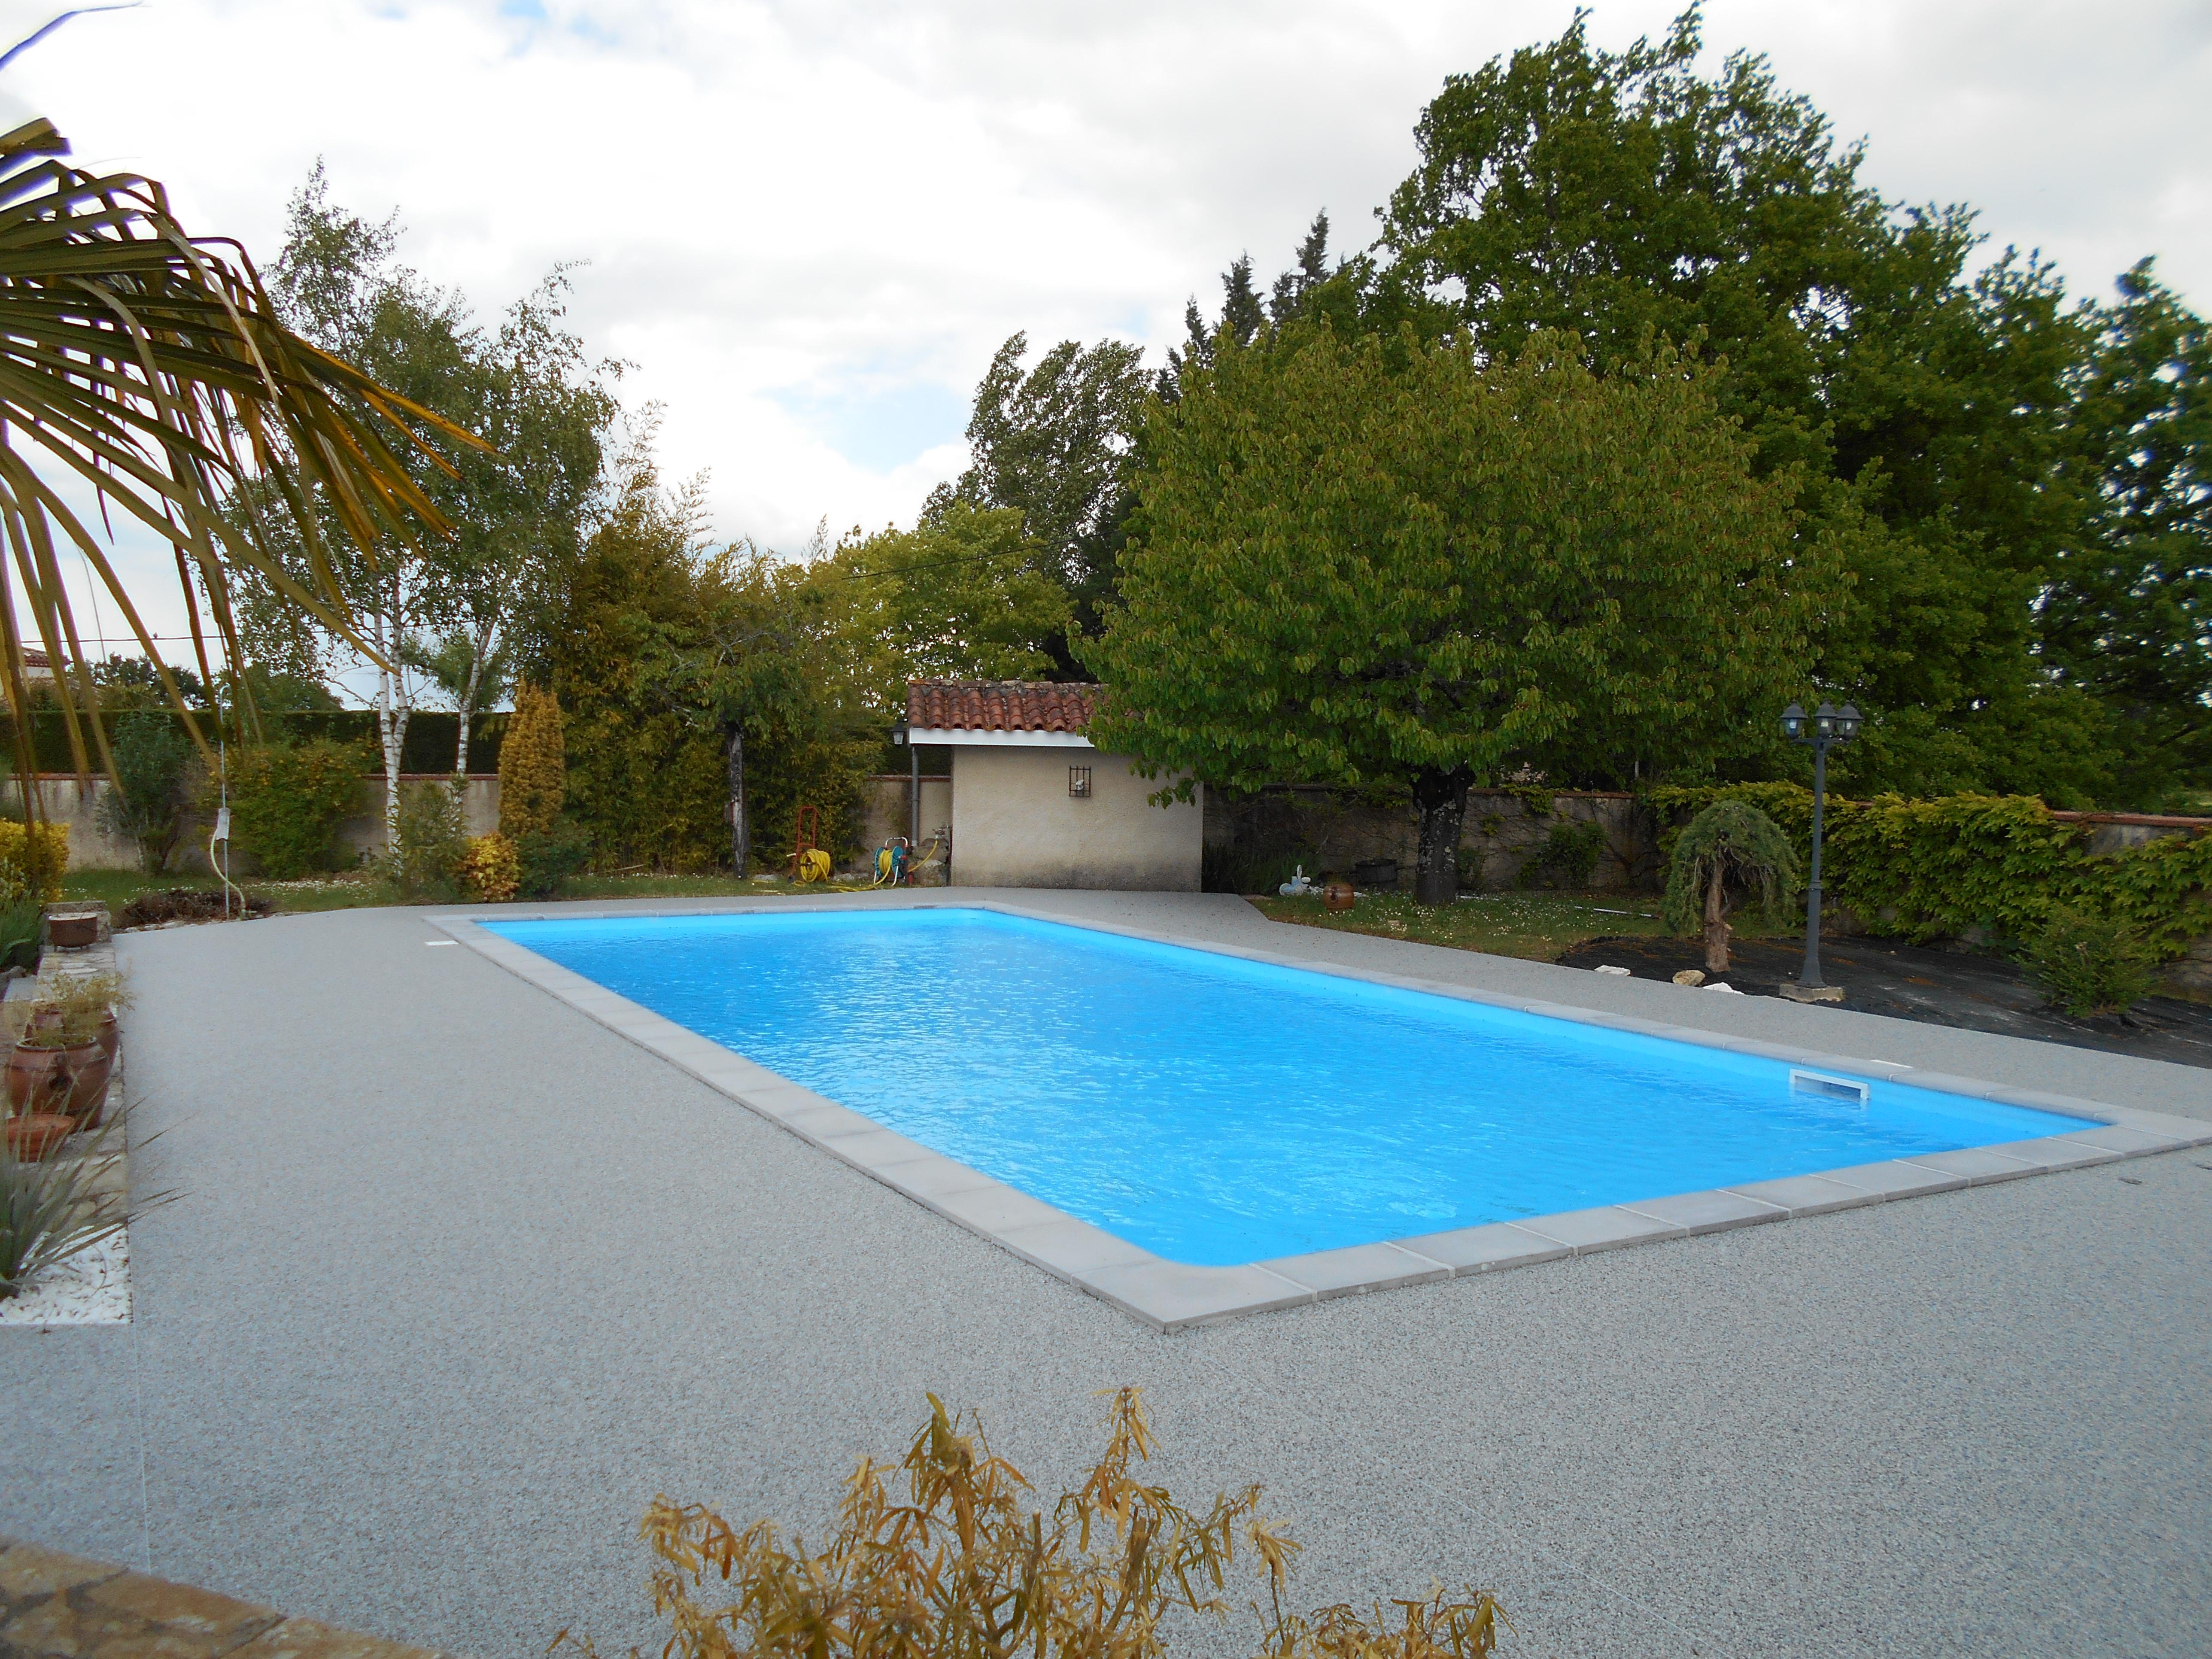 Plage piscine Caussade